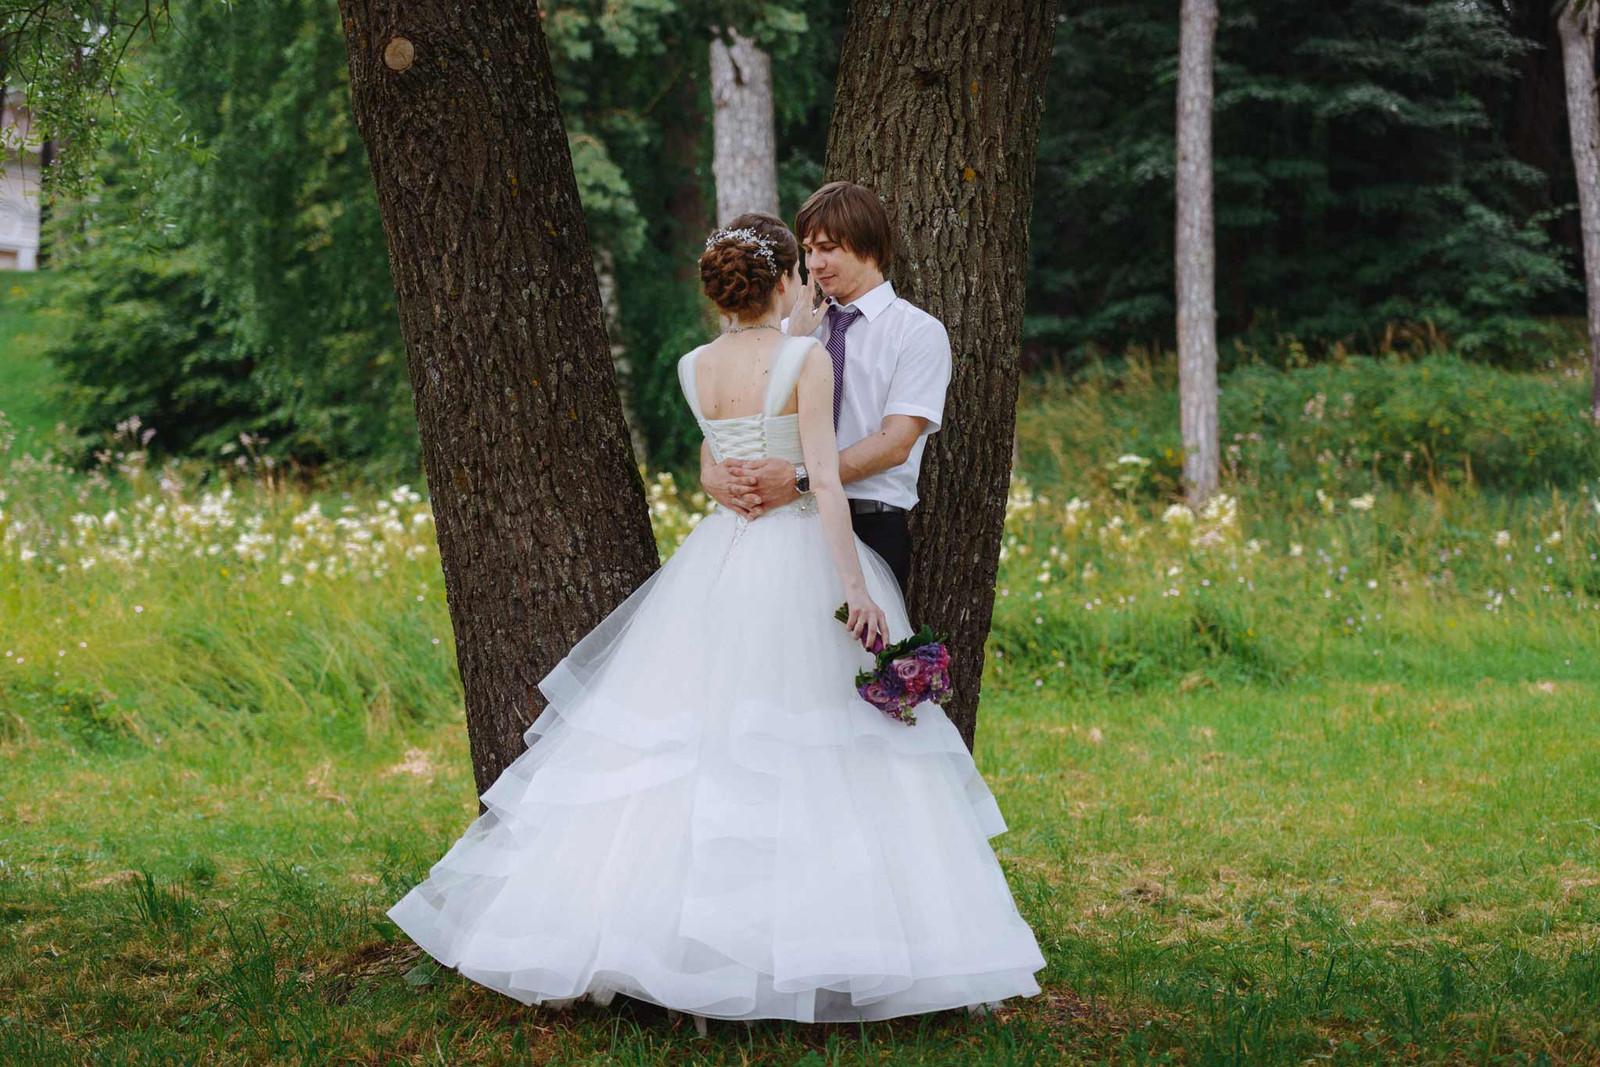 Свадьба усадьба валуево фото